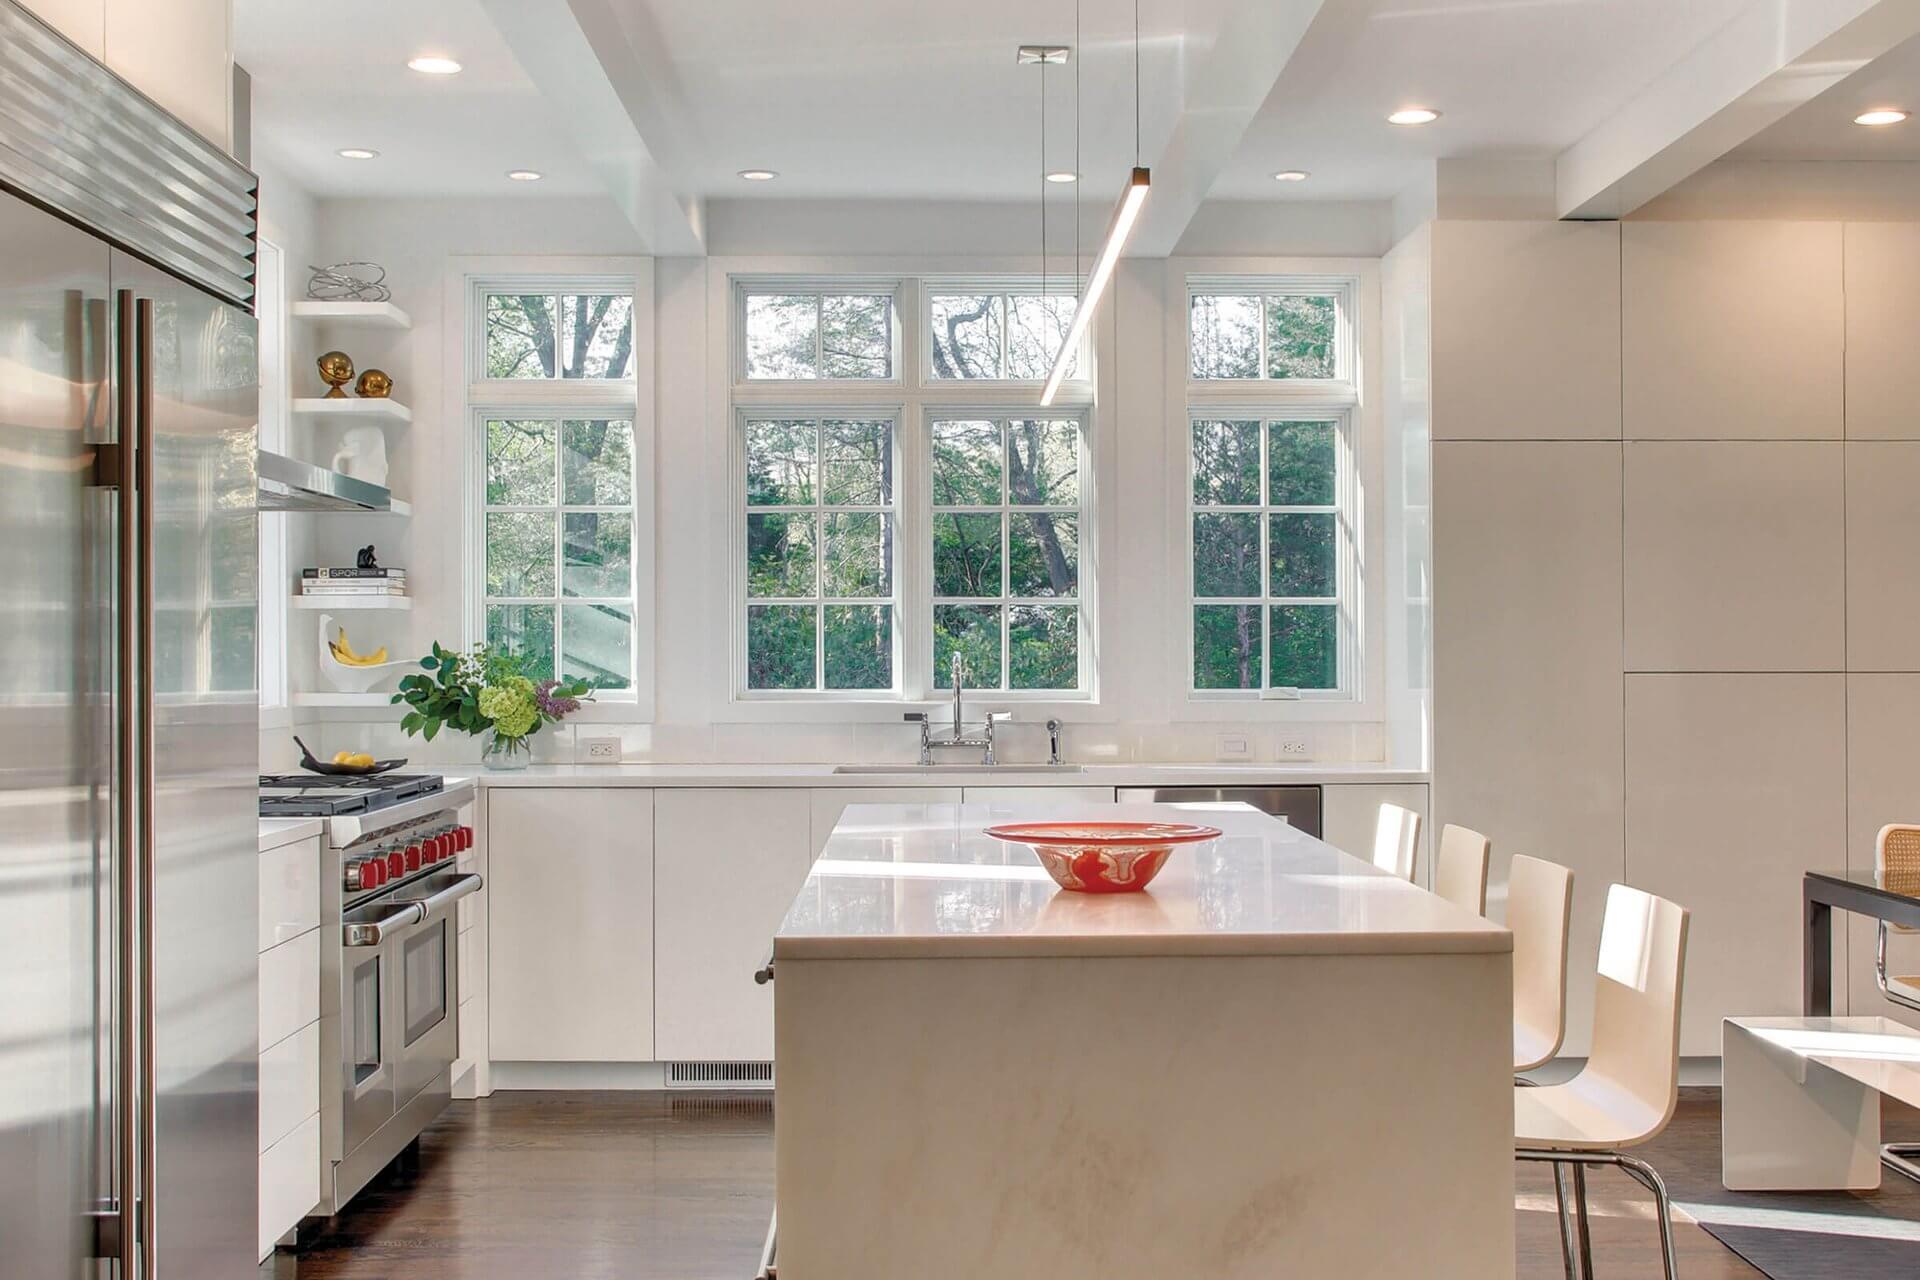 elevate-casement-narrow-frame-2-bluehouse